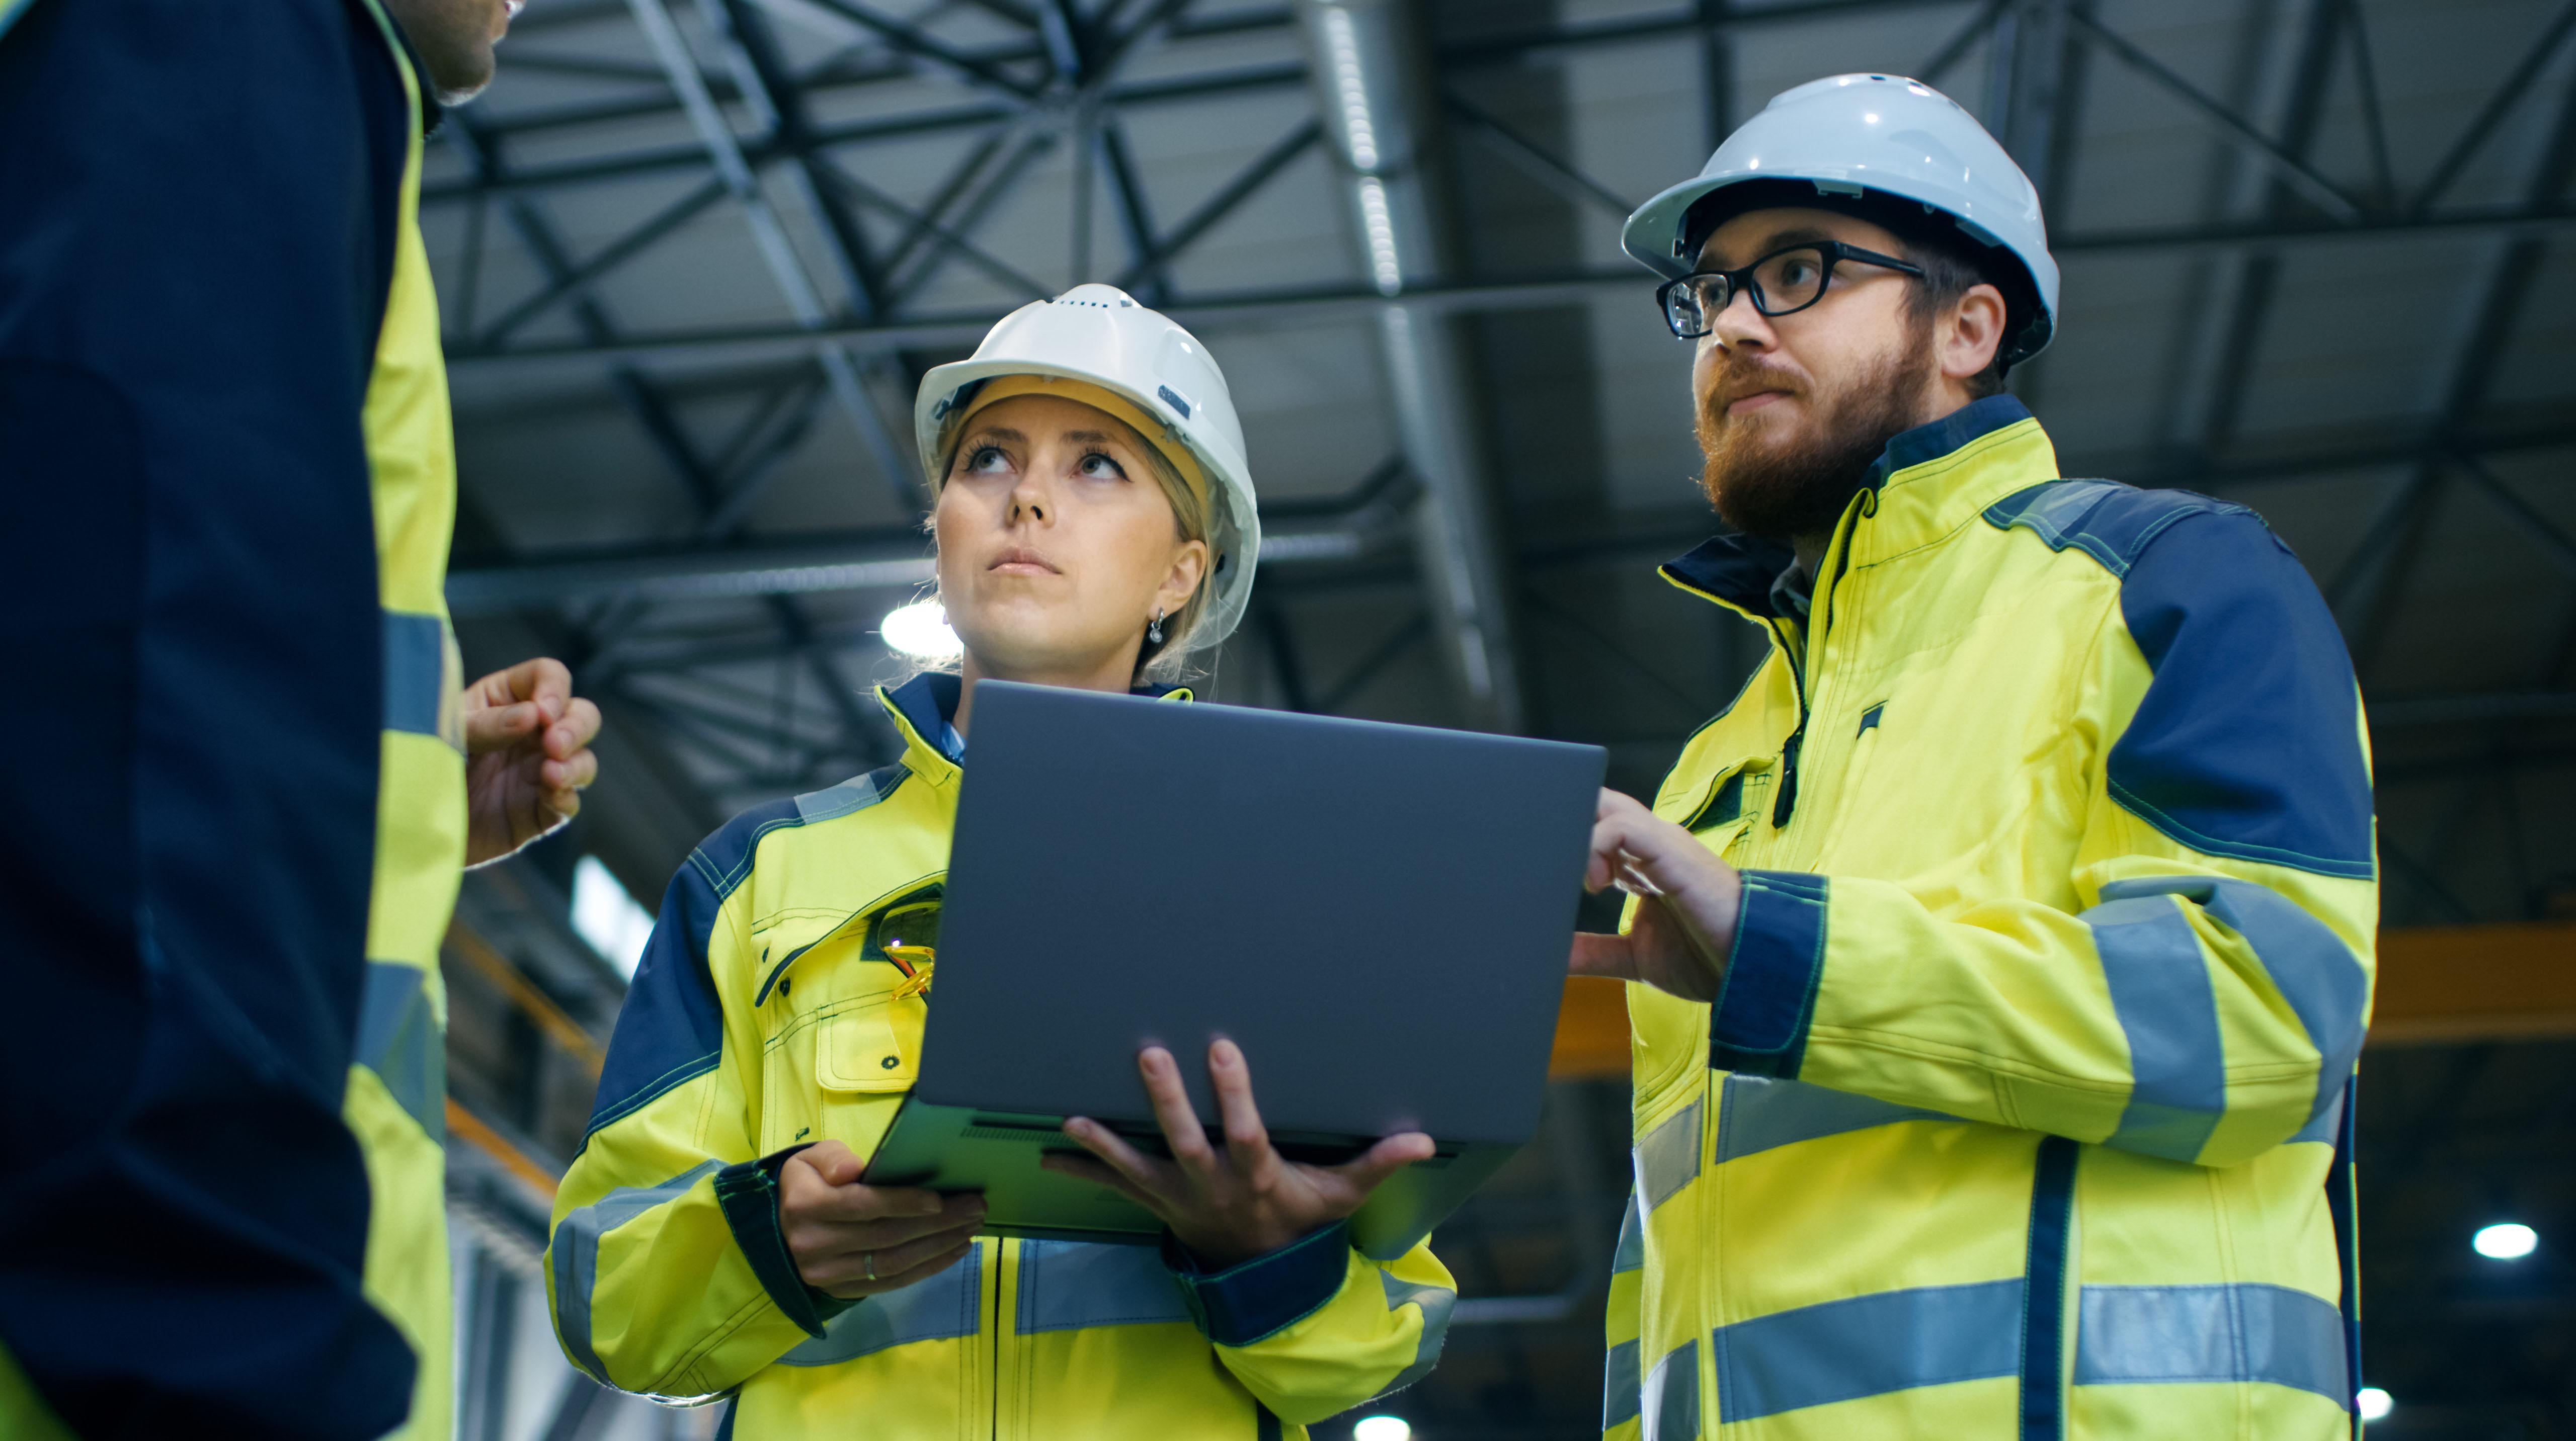 Top 3 Challenges Facing Facilities Engineers